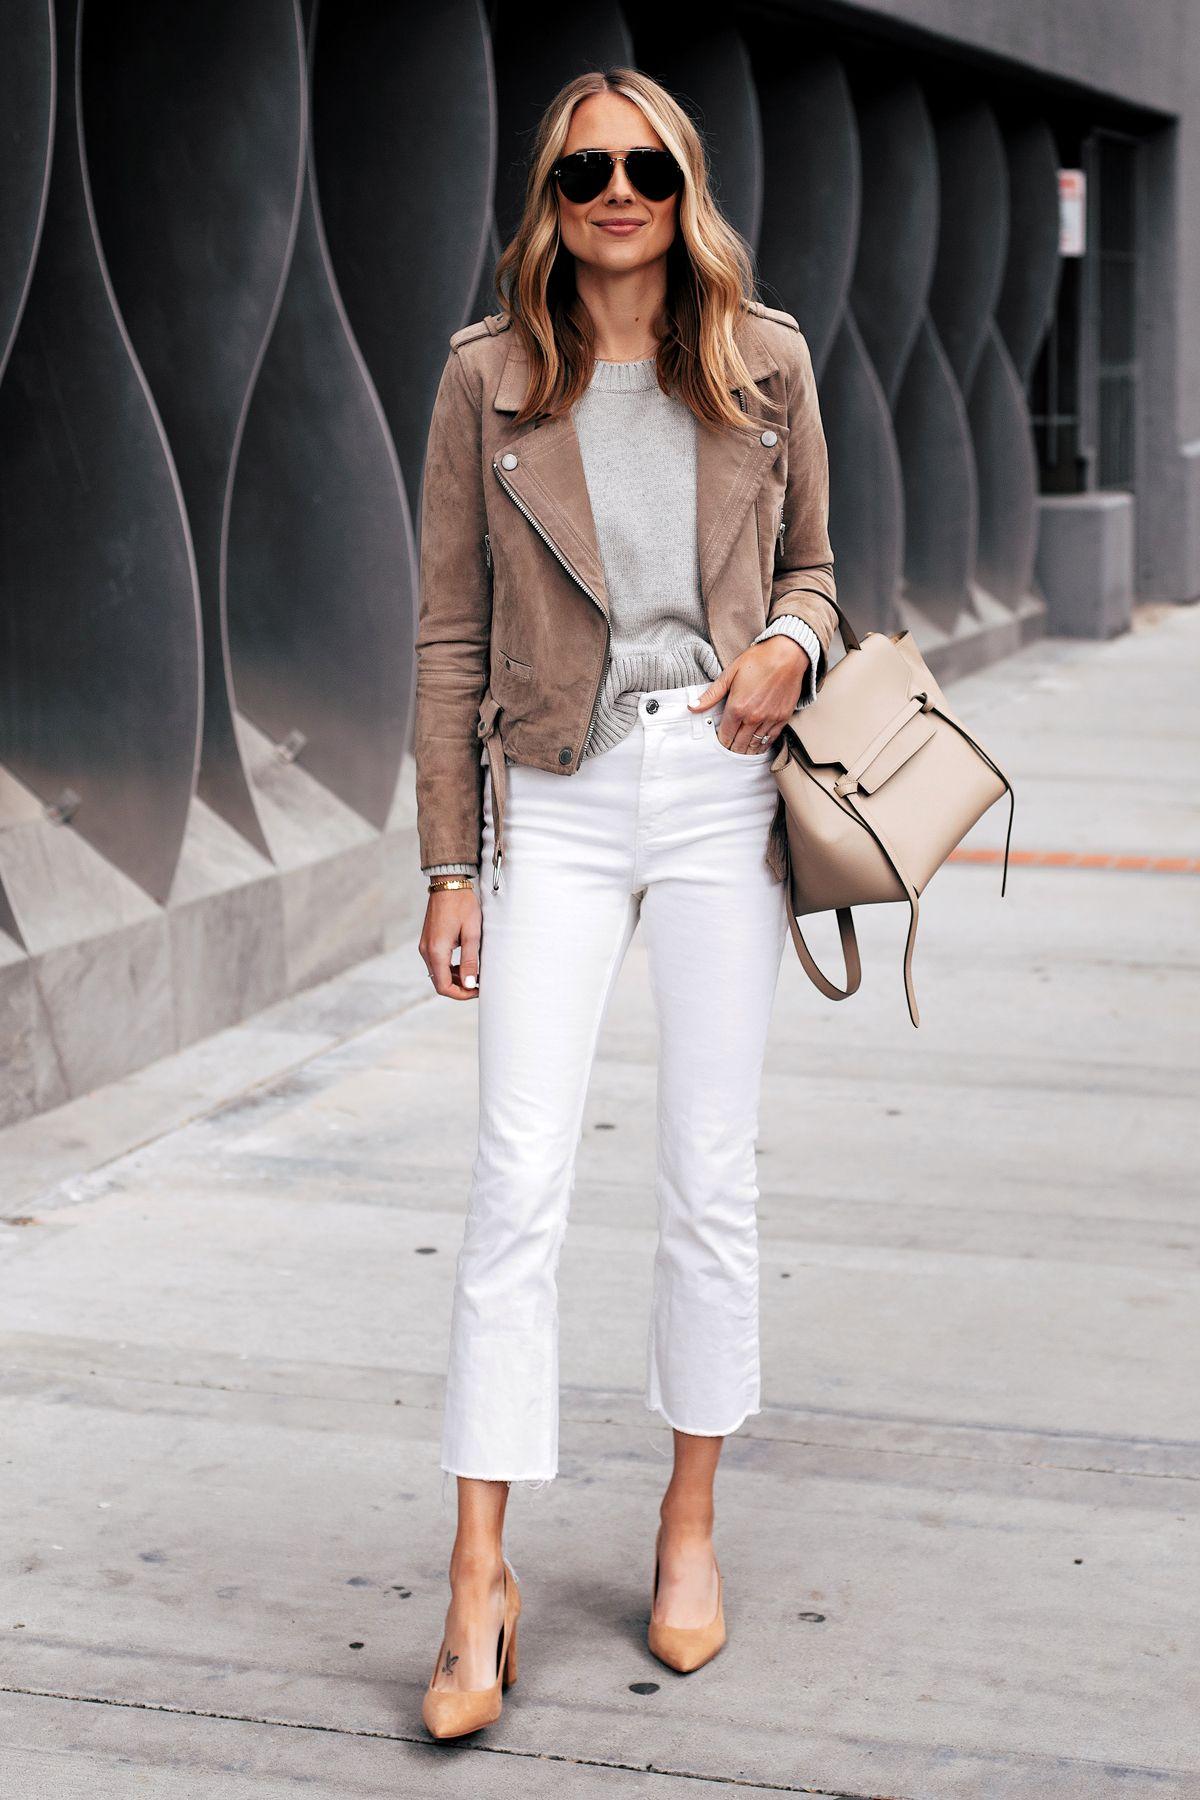 Fashion Jackson Capsule Wardrobe Wearing Blanknyc Tan Suede Moto Jacket Grey Swe…